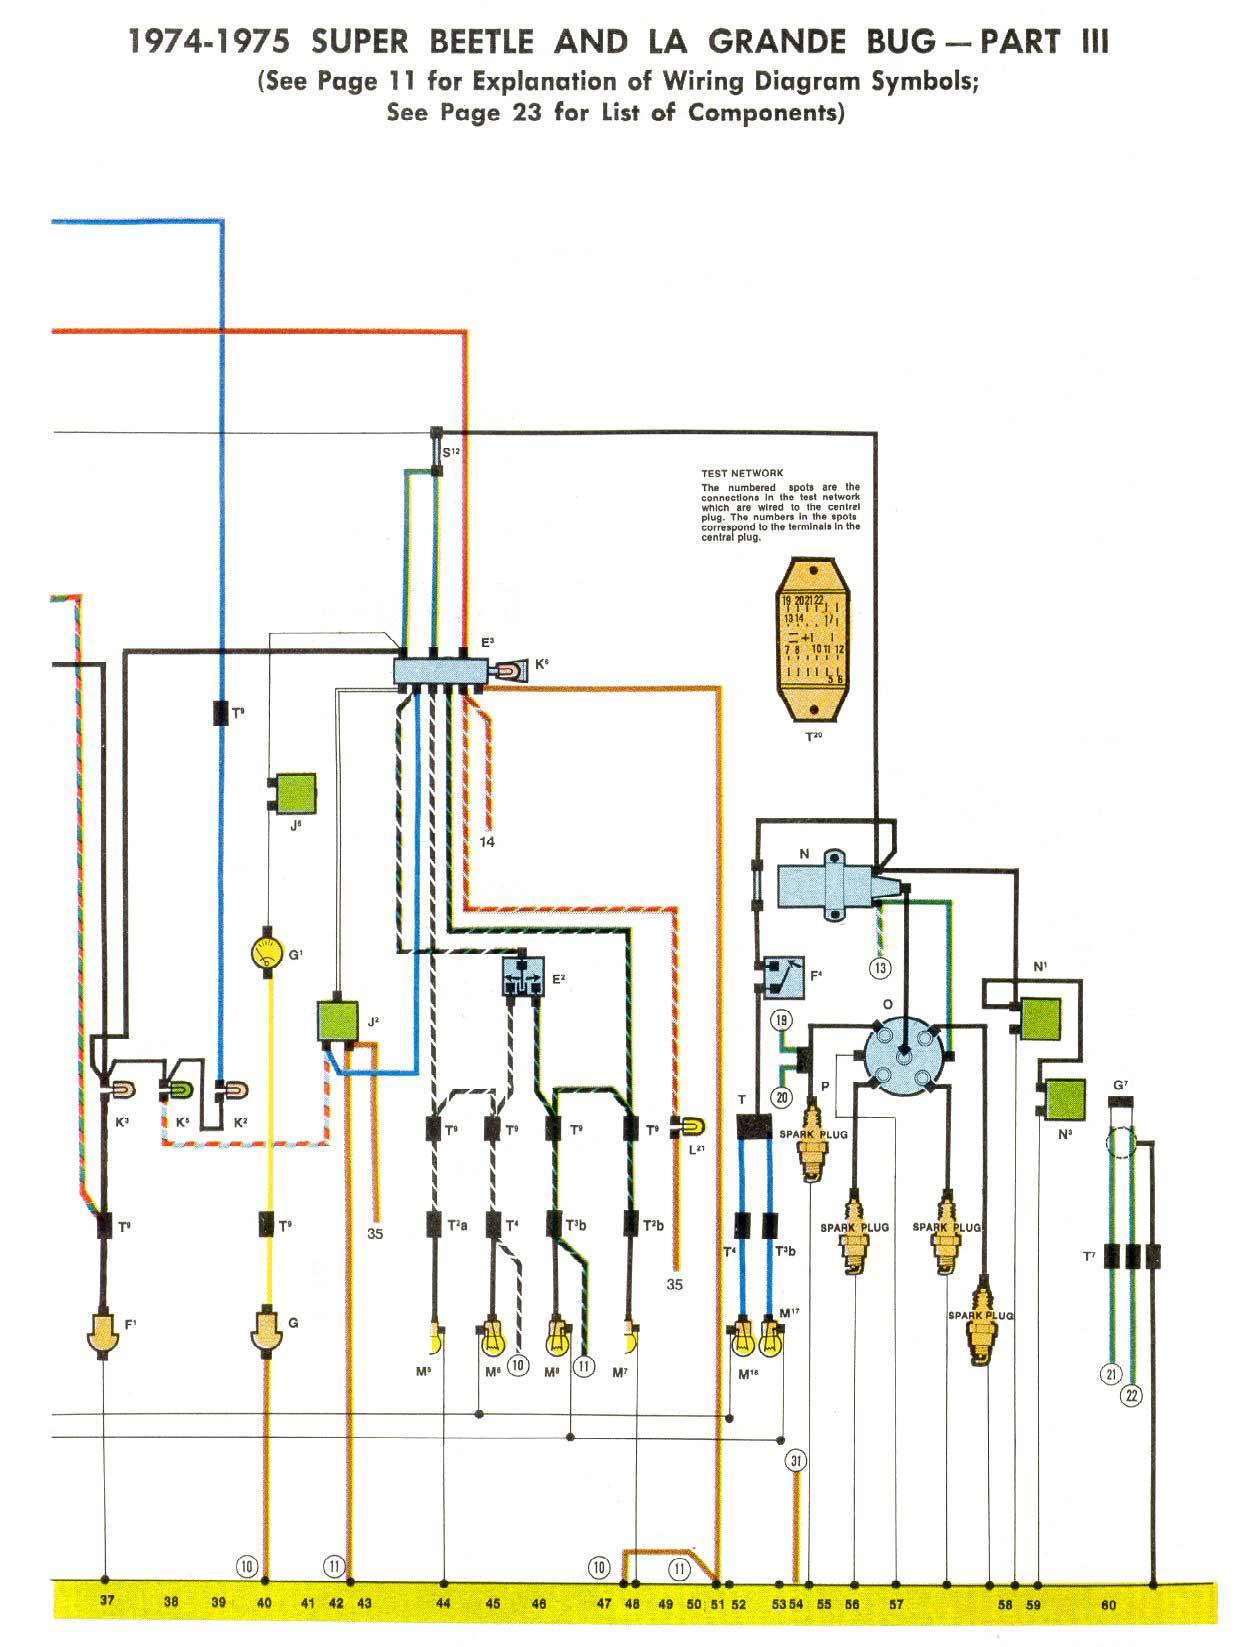 1975 Volkswagen Wiring Diagram Detailed Schematics Fiat Color Vwtyp1 Com Fuel